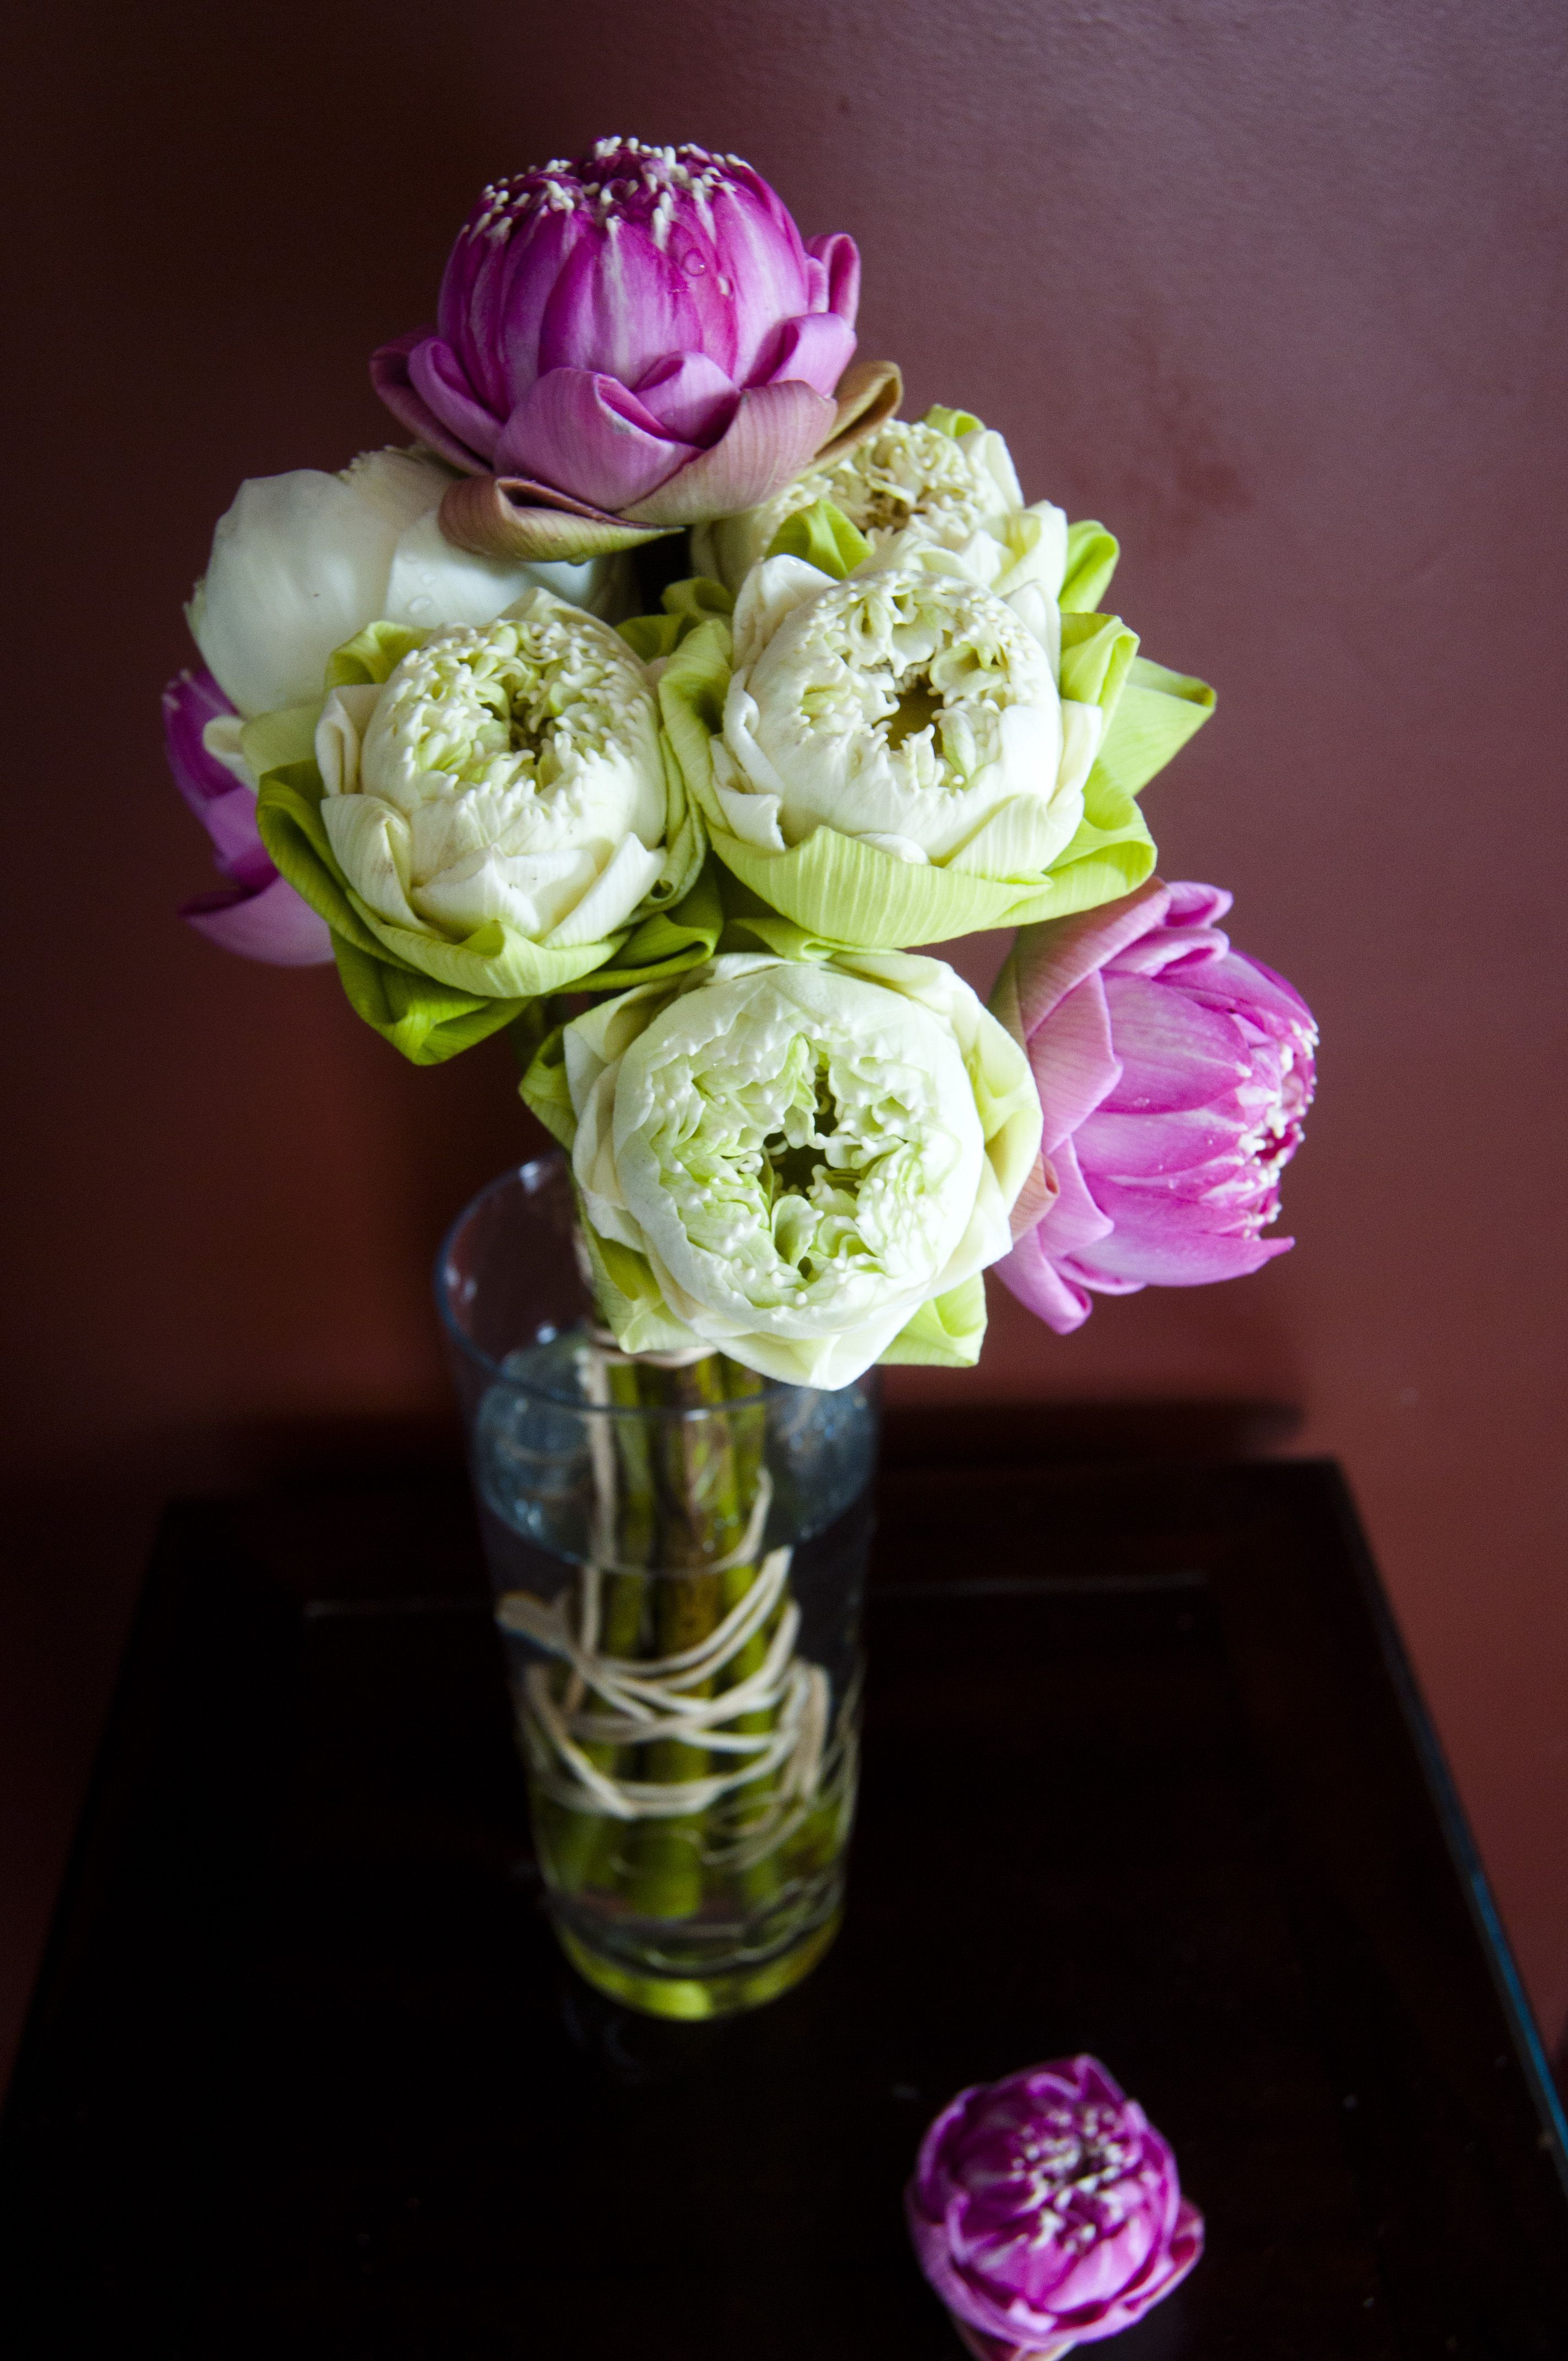 Lotus flower bouquet 3 3 3 3 3 wedding pinterest lotus lotus flower bouquet 3 3 3 3 3 izmirmasajfo